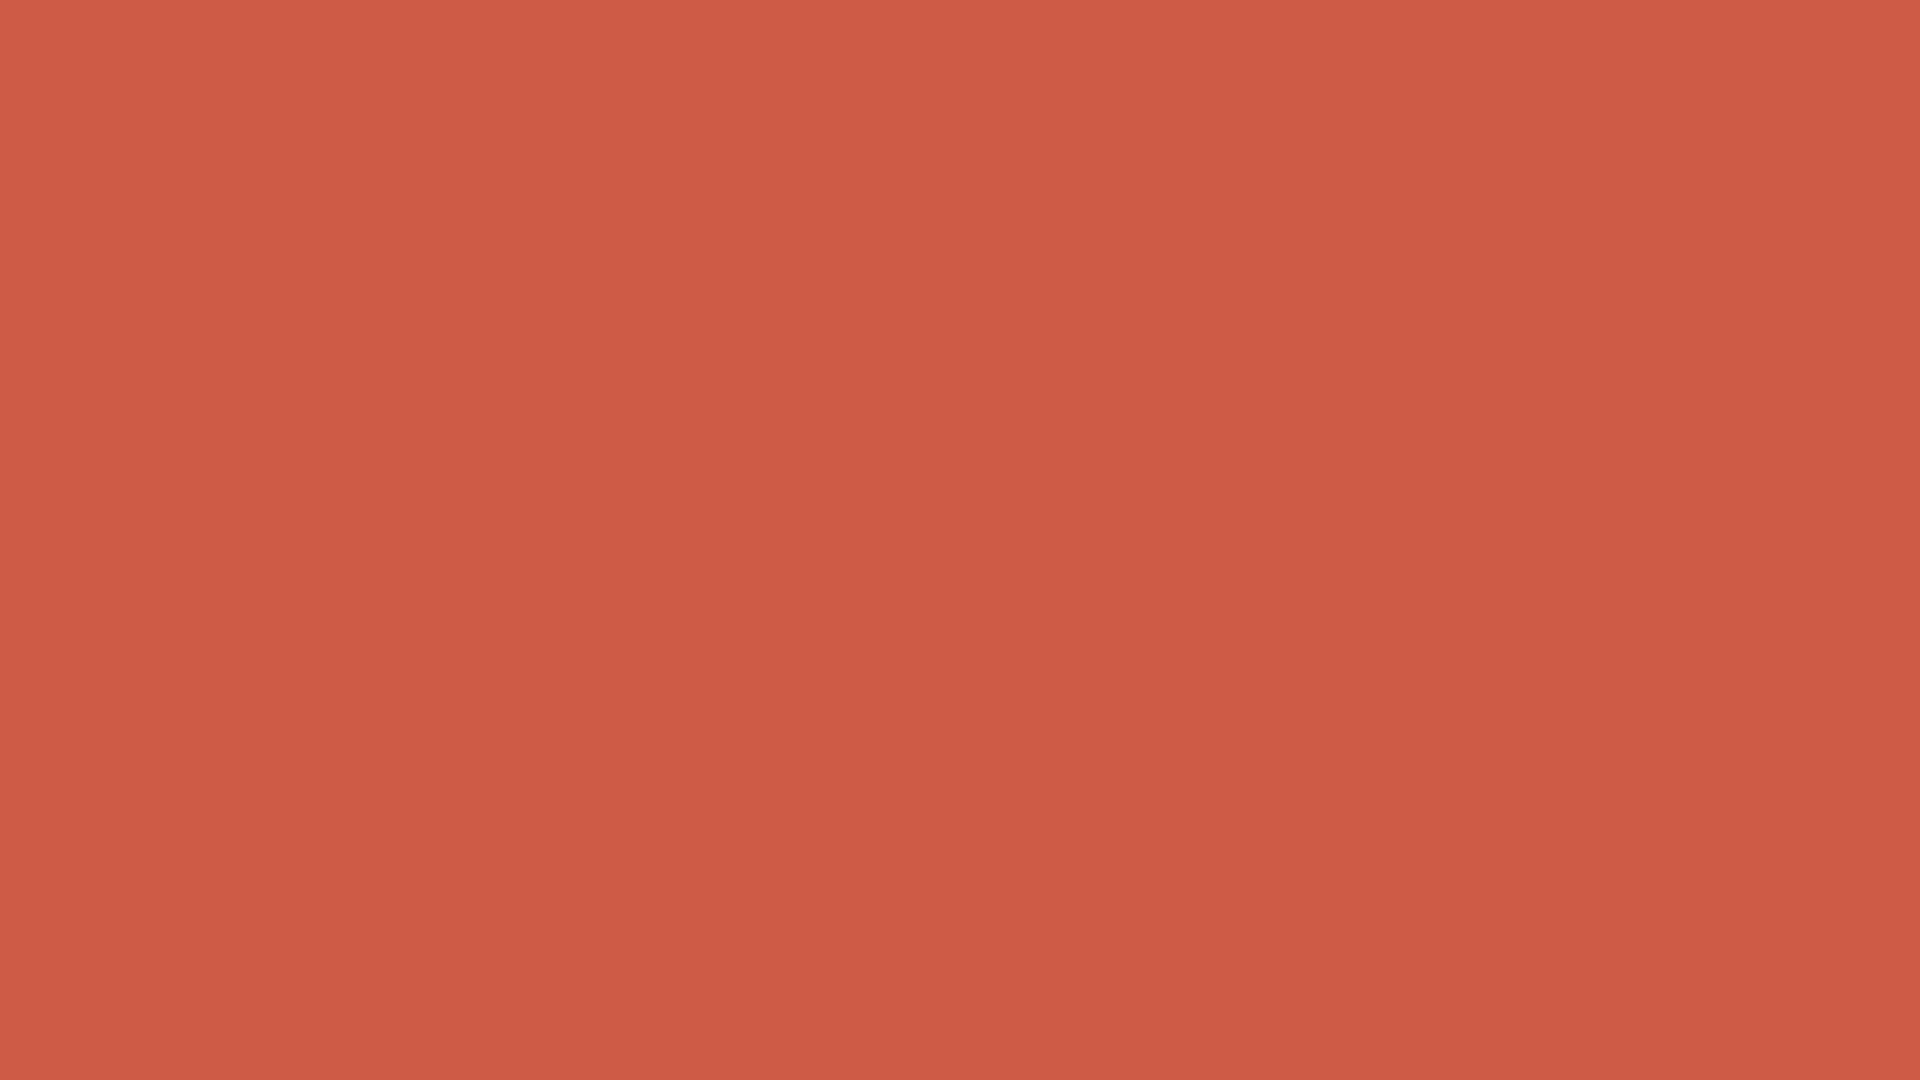 1920x1080 Dark Coral Solid Color Background